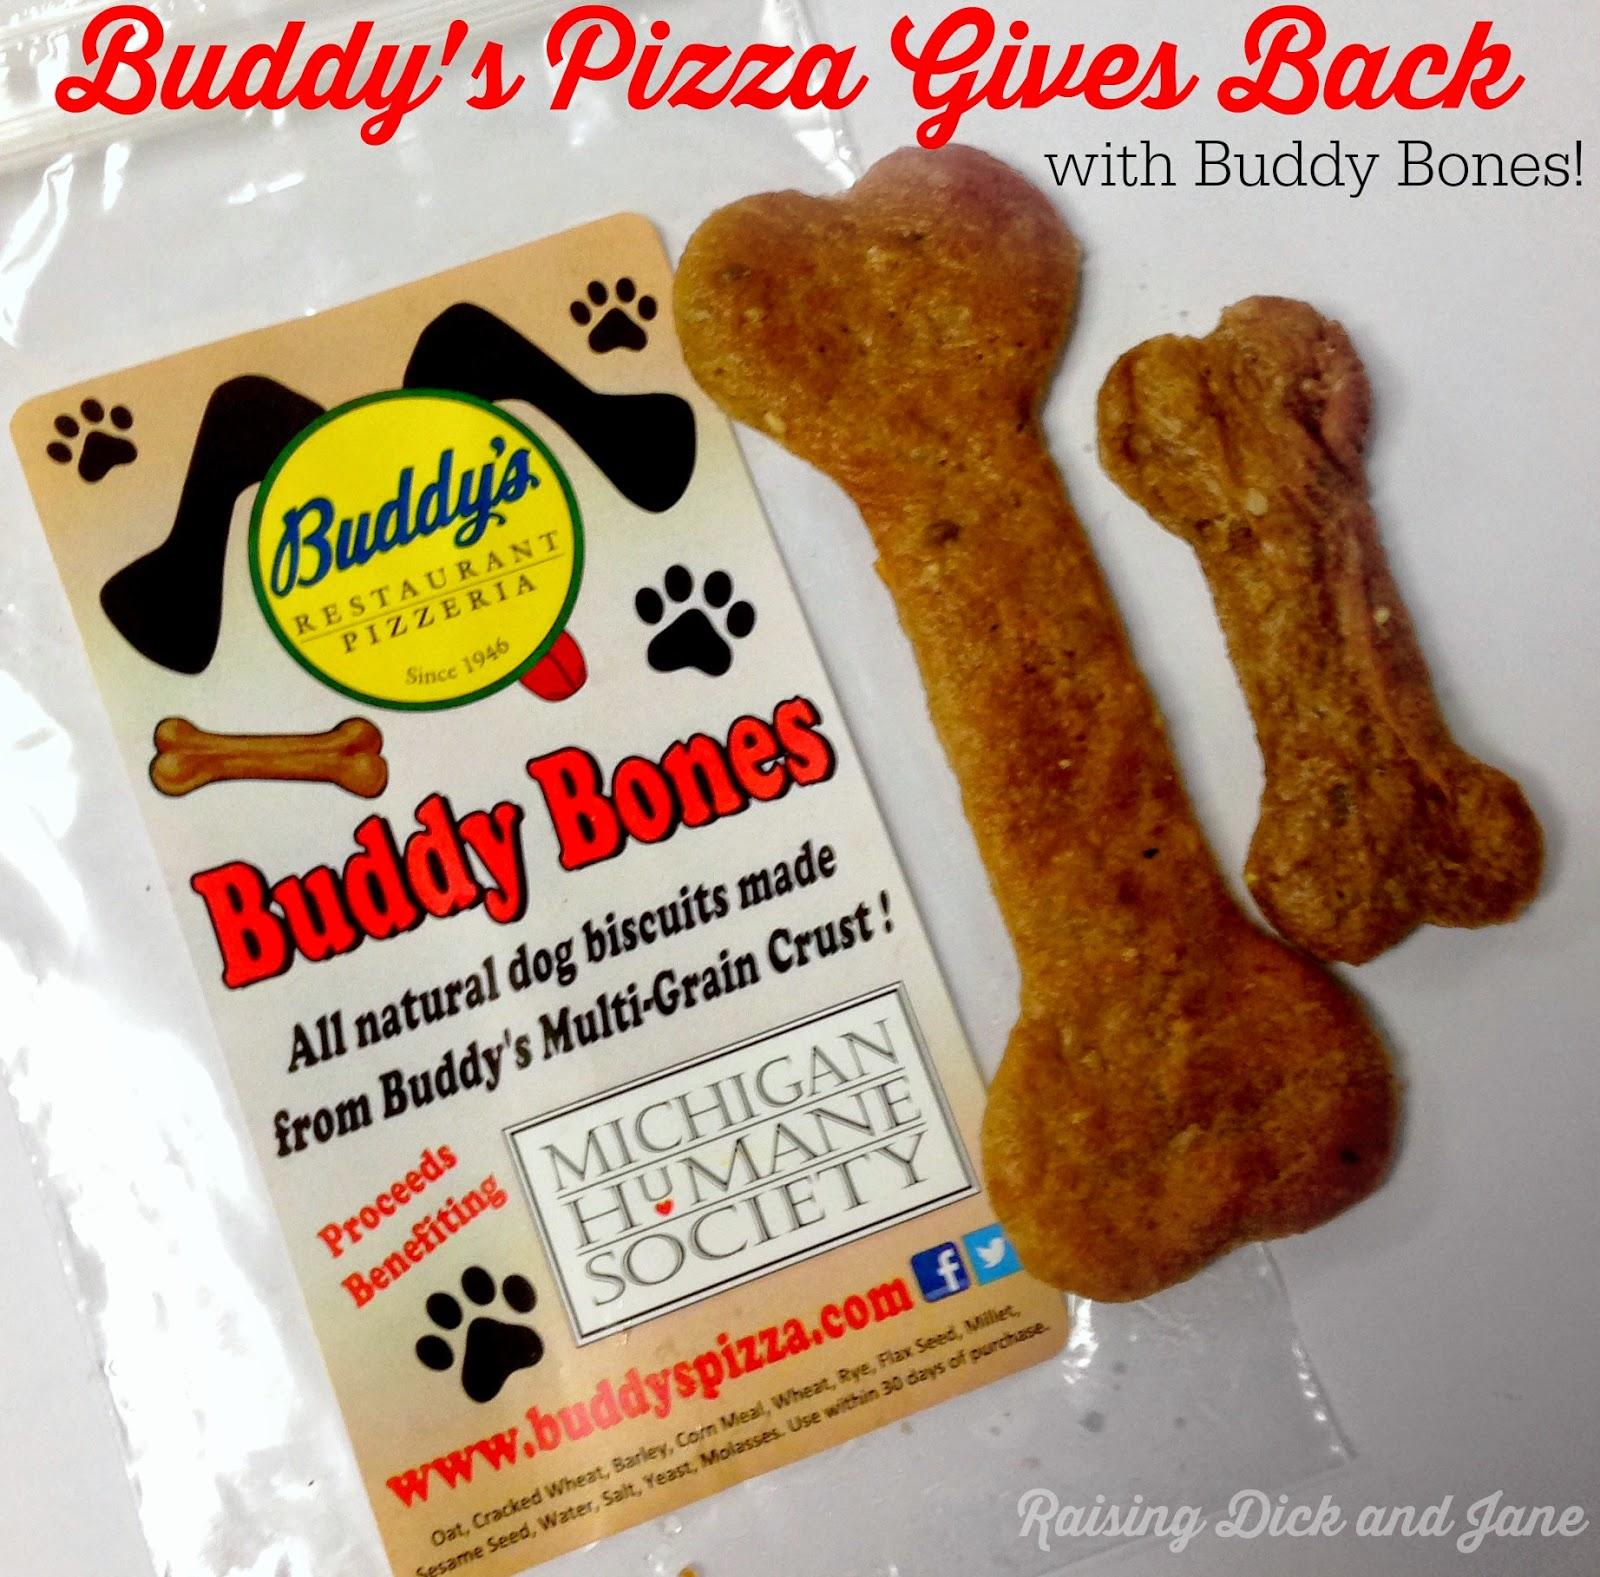 #ad @BuddysPizza Buddy Bones